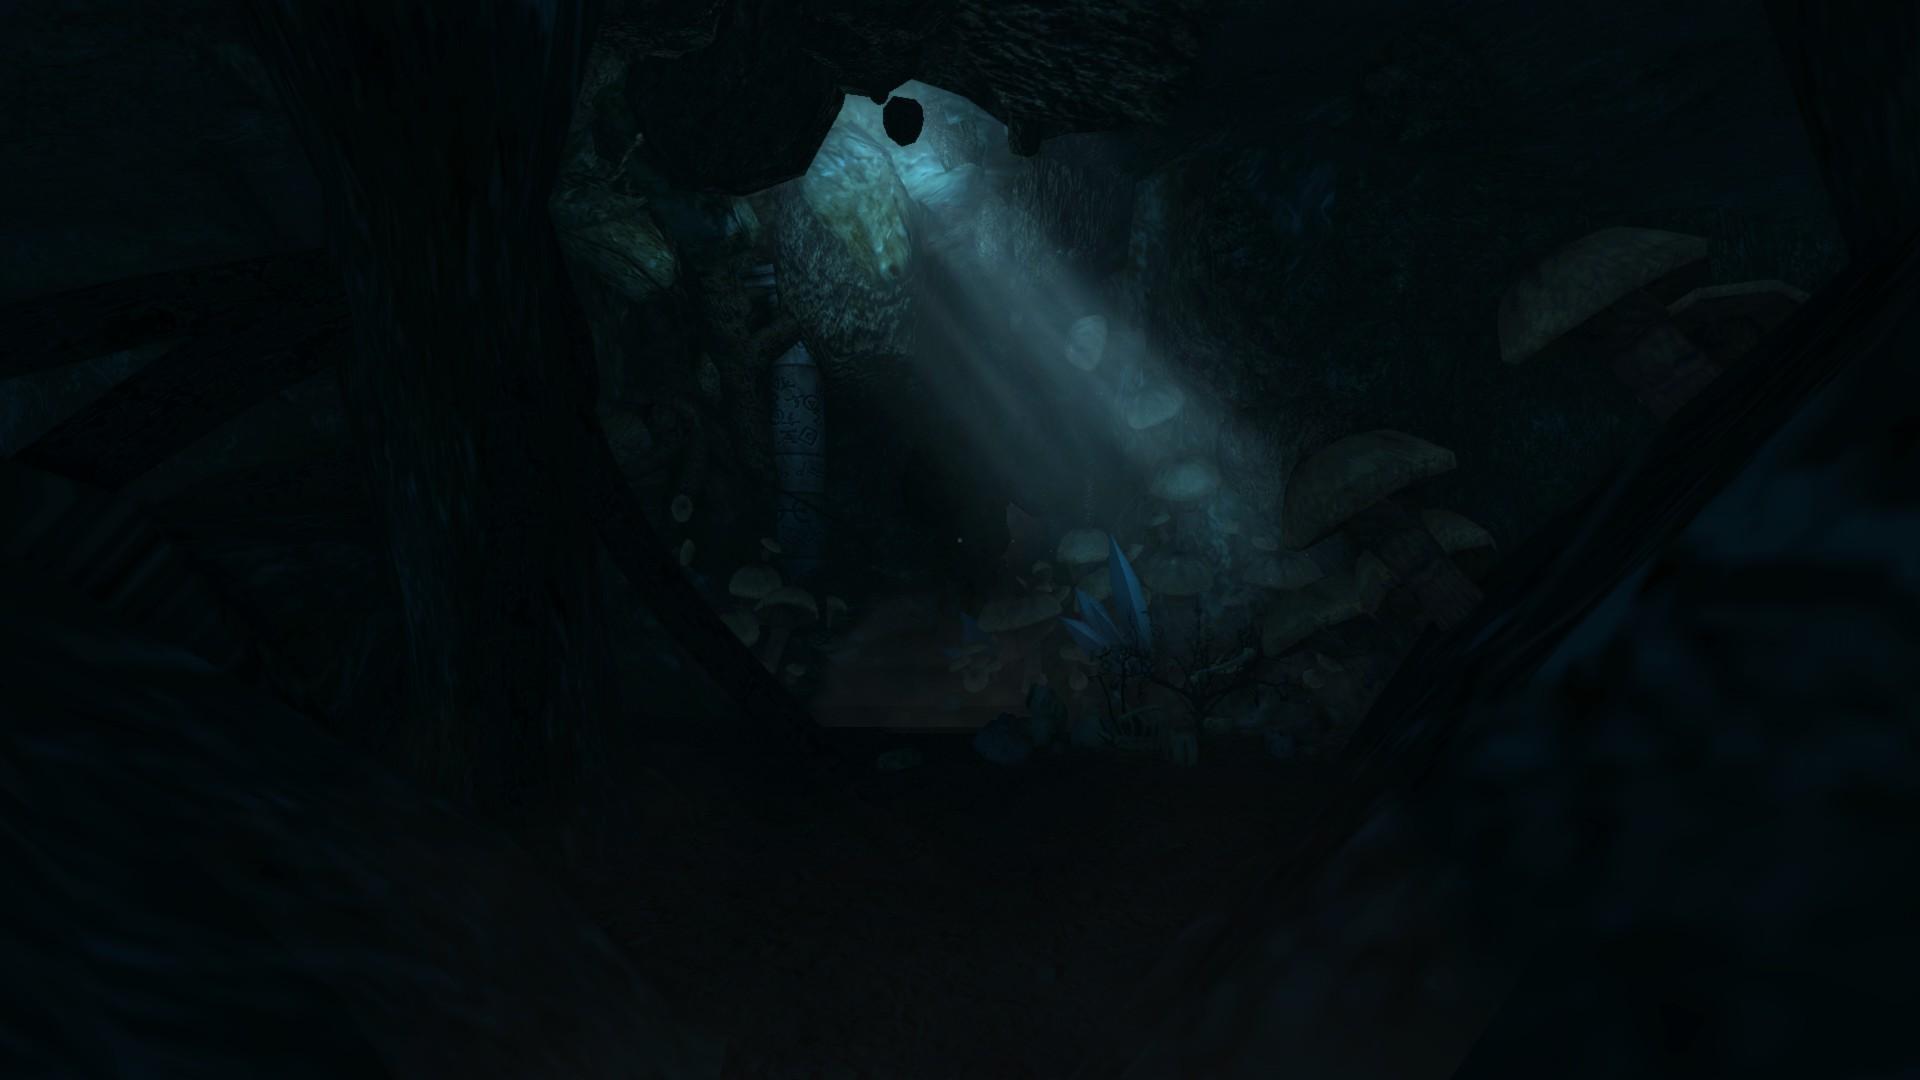 Pin dark cave entrance on pinterest